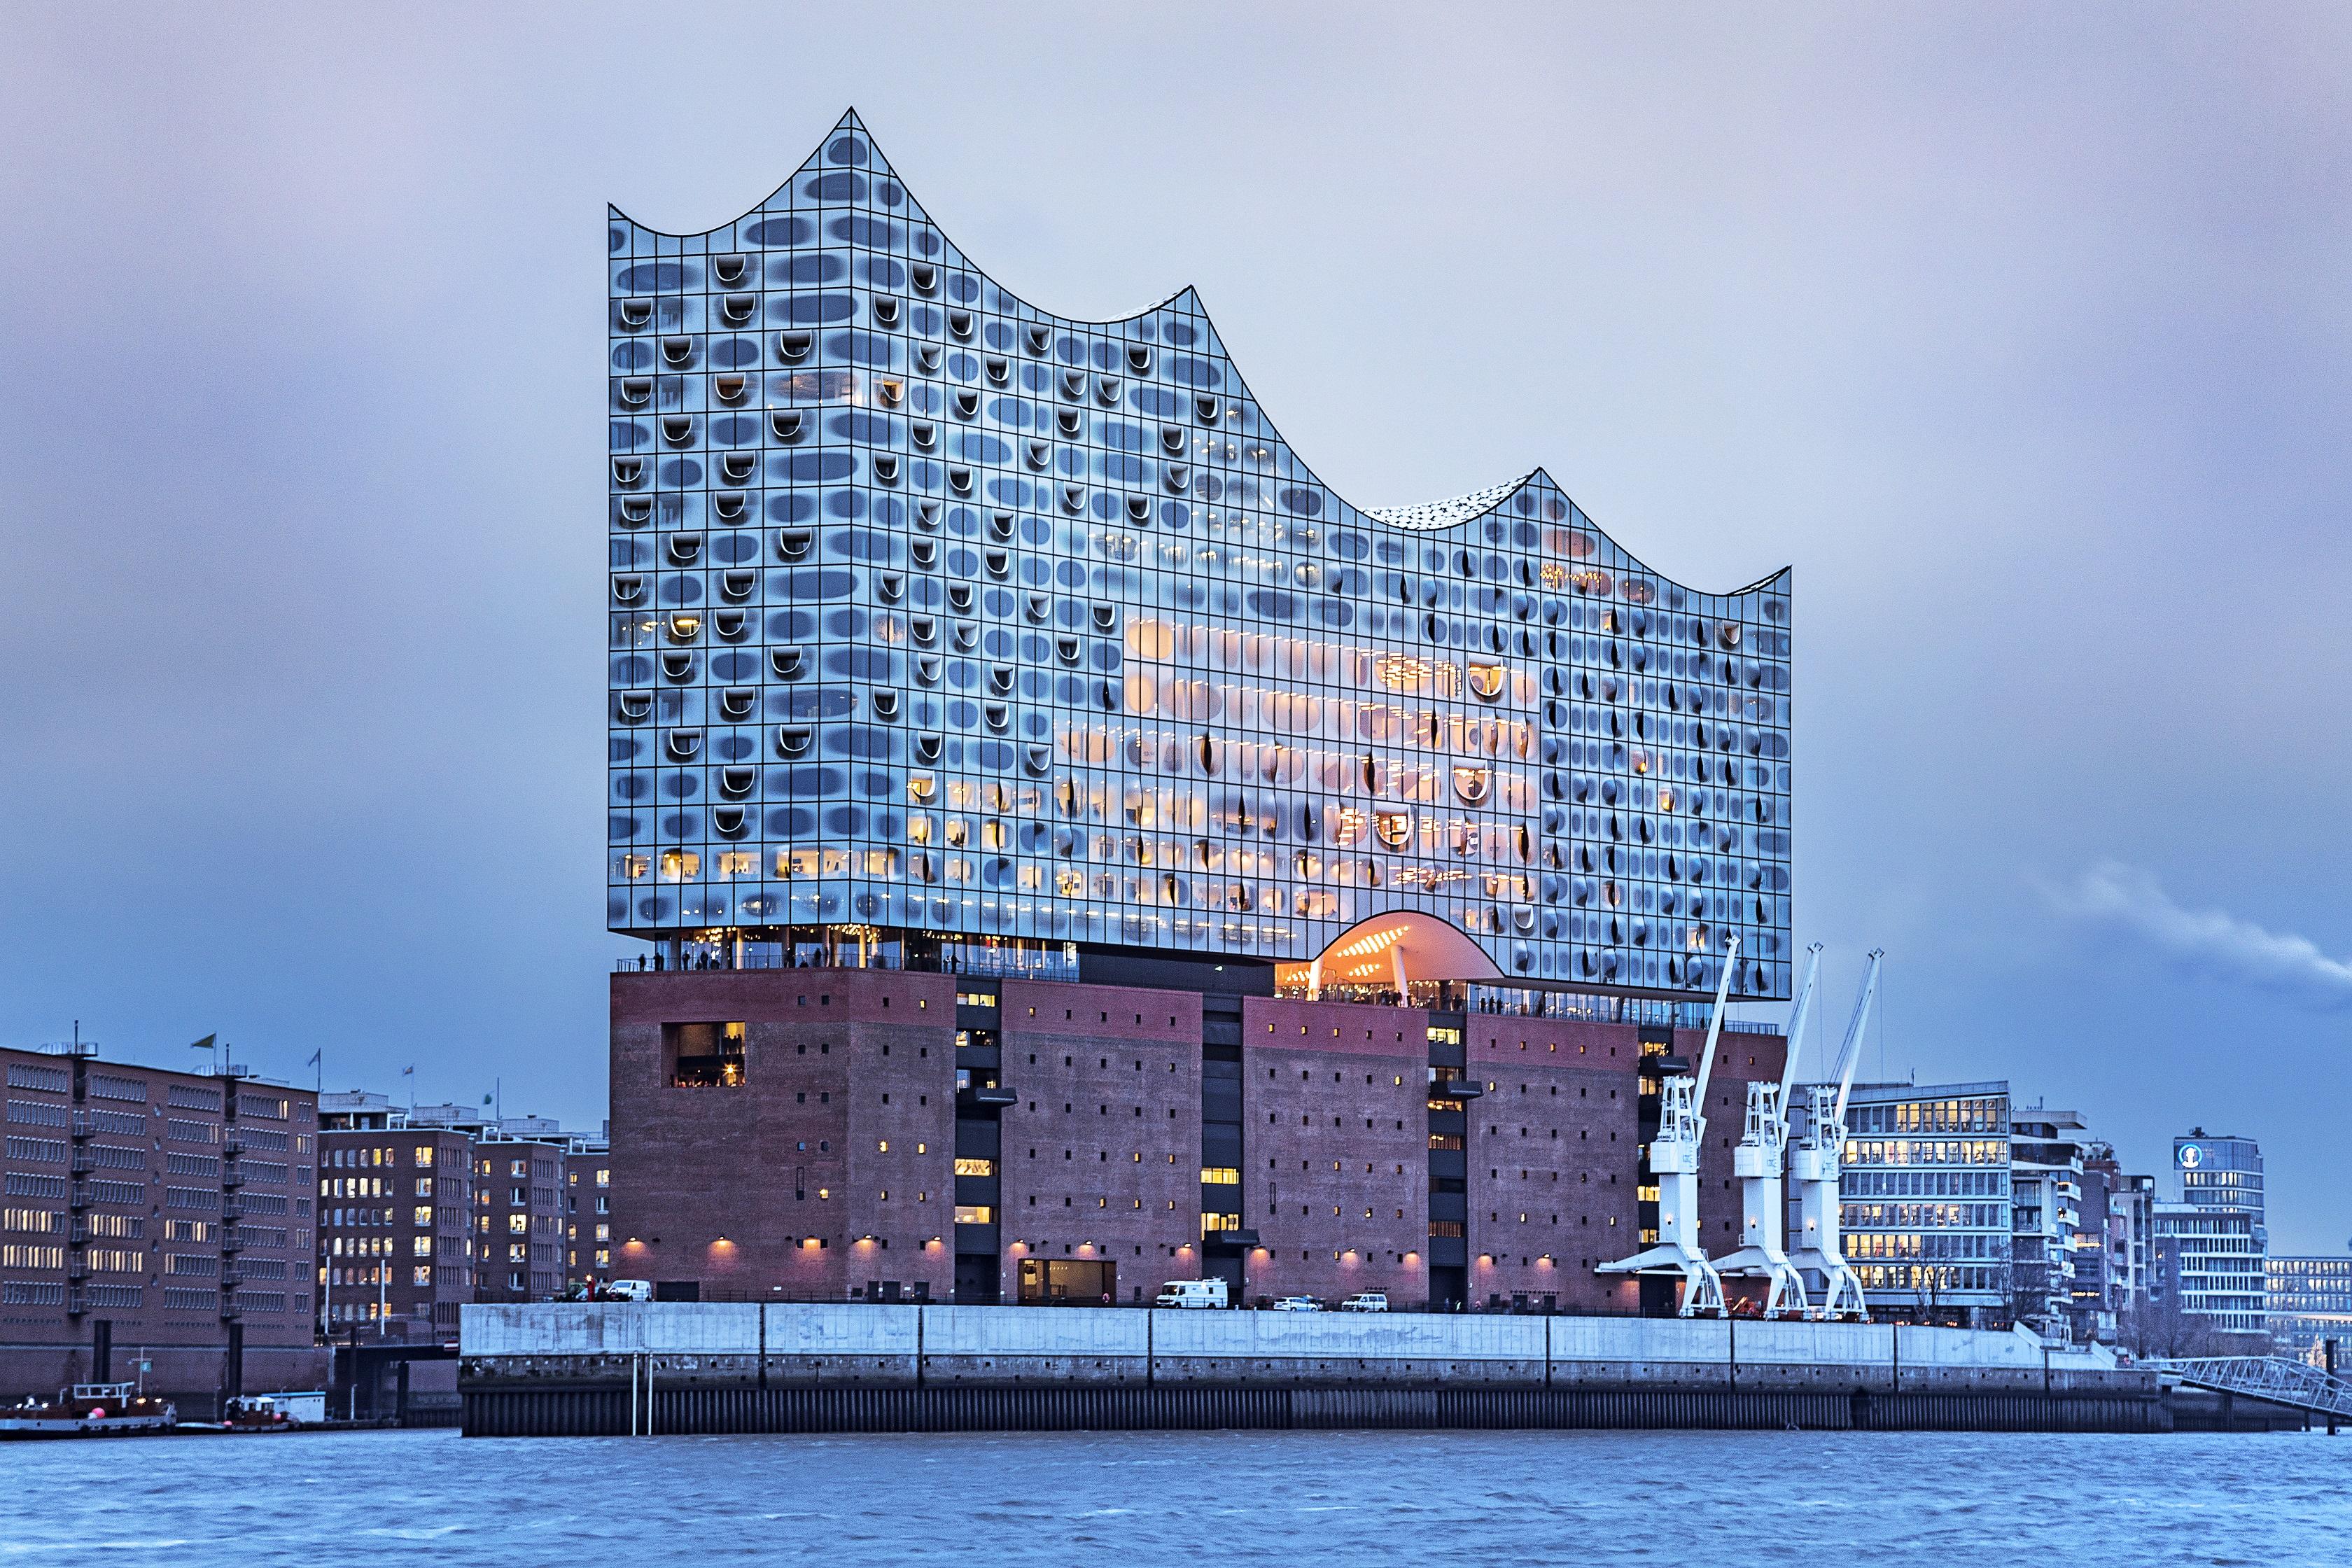 5º lugar: Elbphilharmonie Hamburg/Alemanha